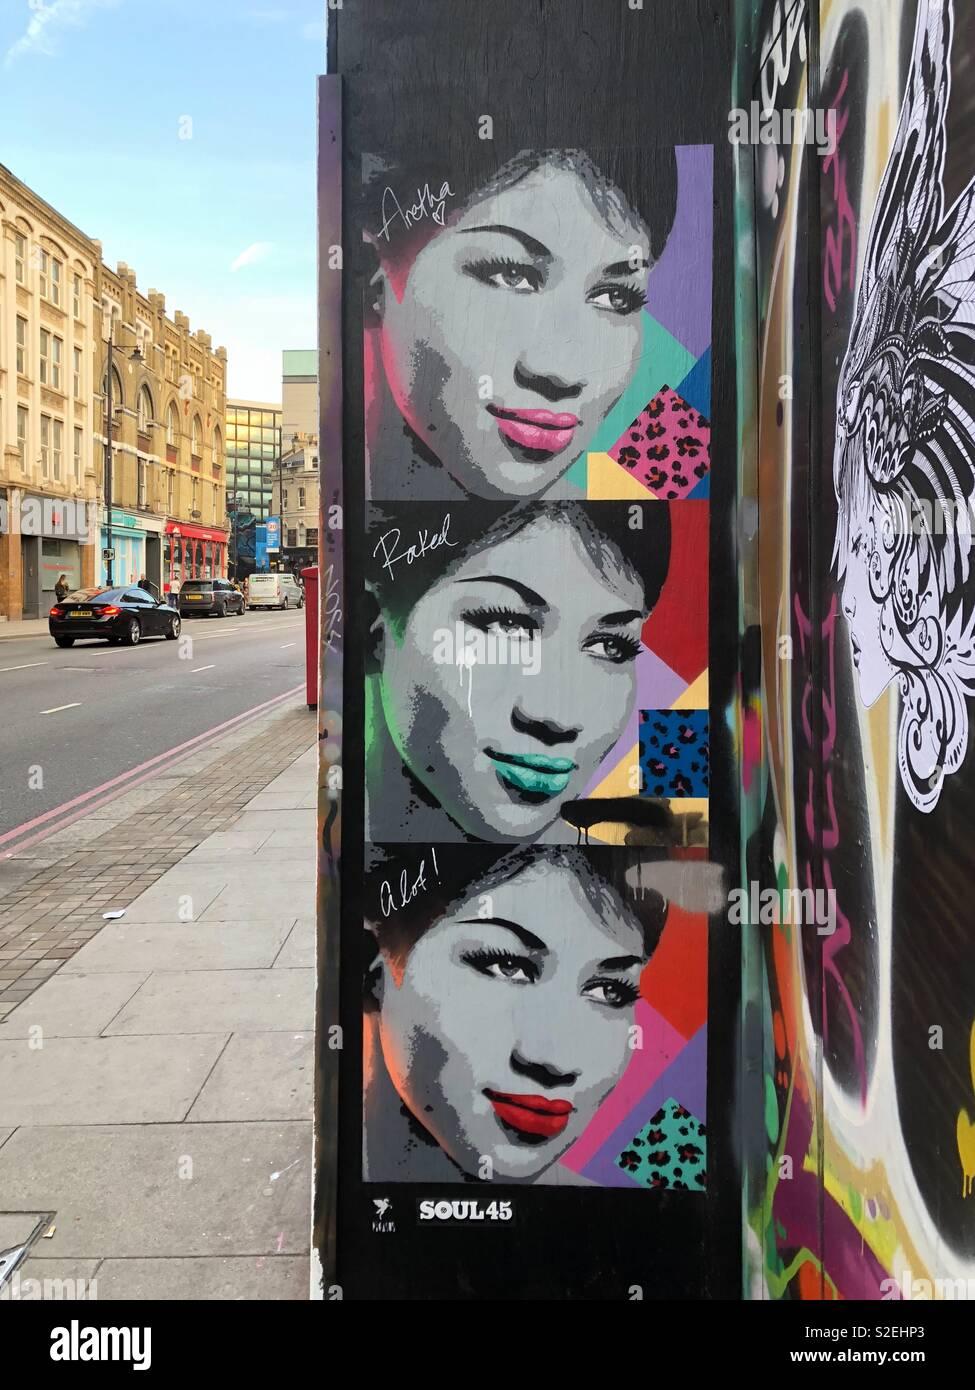 Symbol Aretha Franklin Pop Art Stil graffiti in Hoxton, London, England. Stockfoto